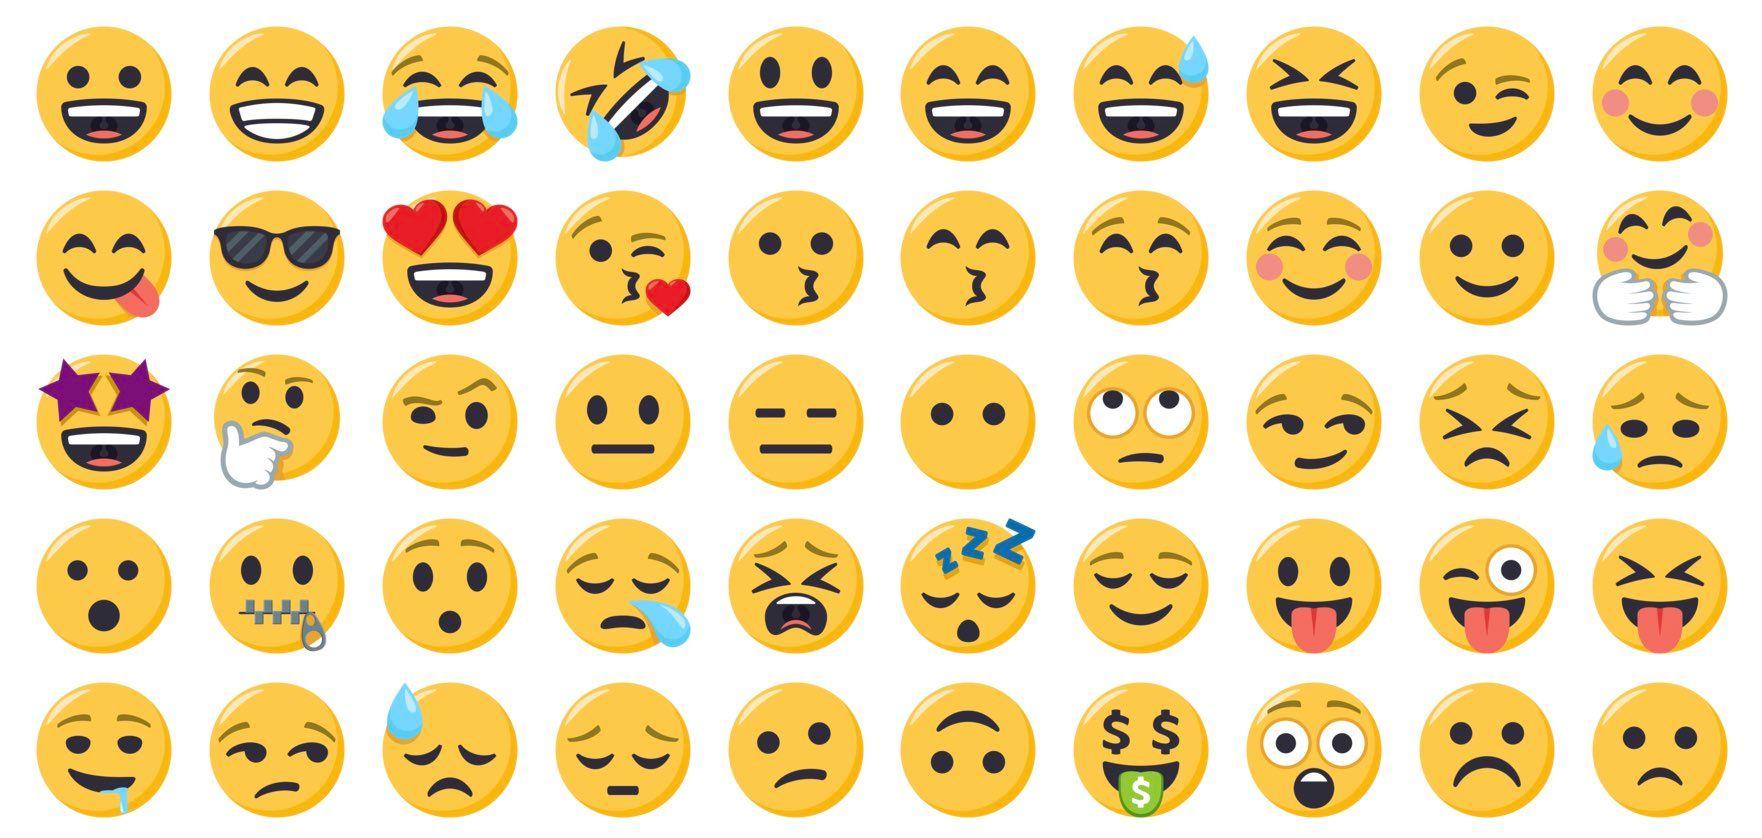 EmojiOne Adds Emoji 5.0 Support